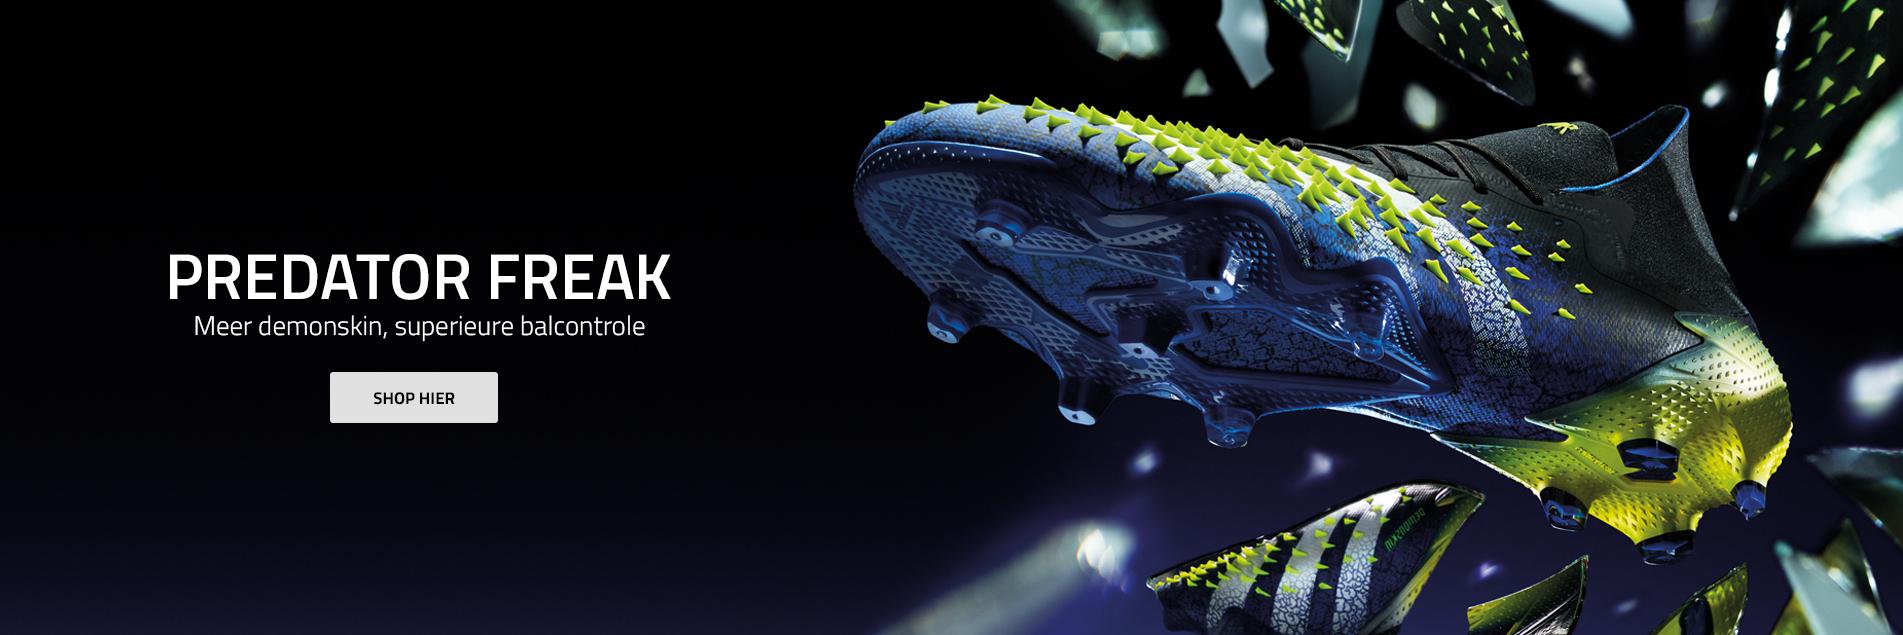 adidas Predator Freak Superlative